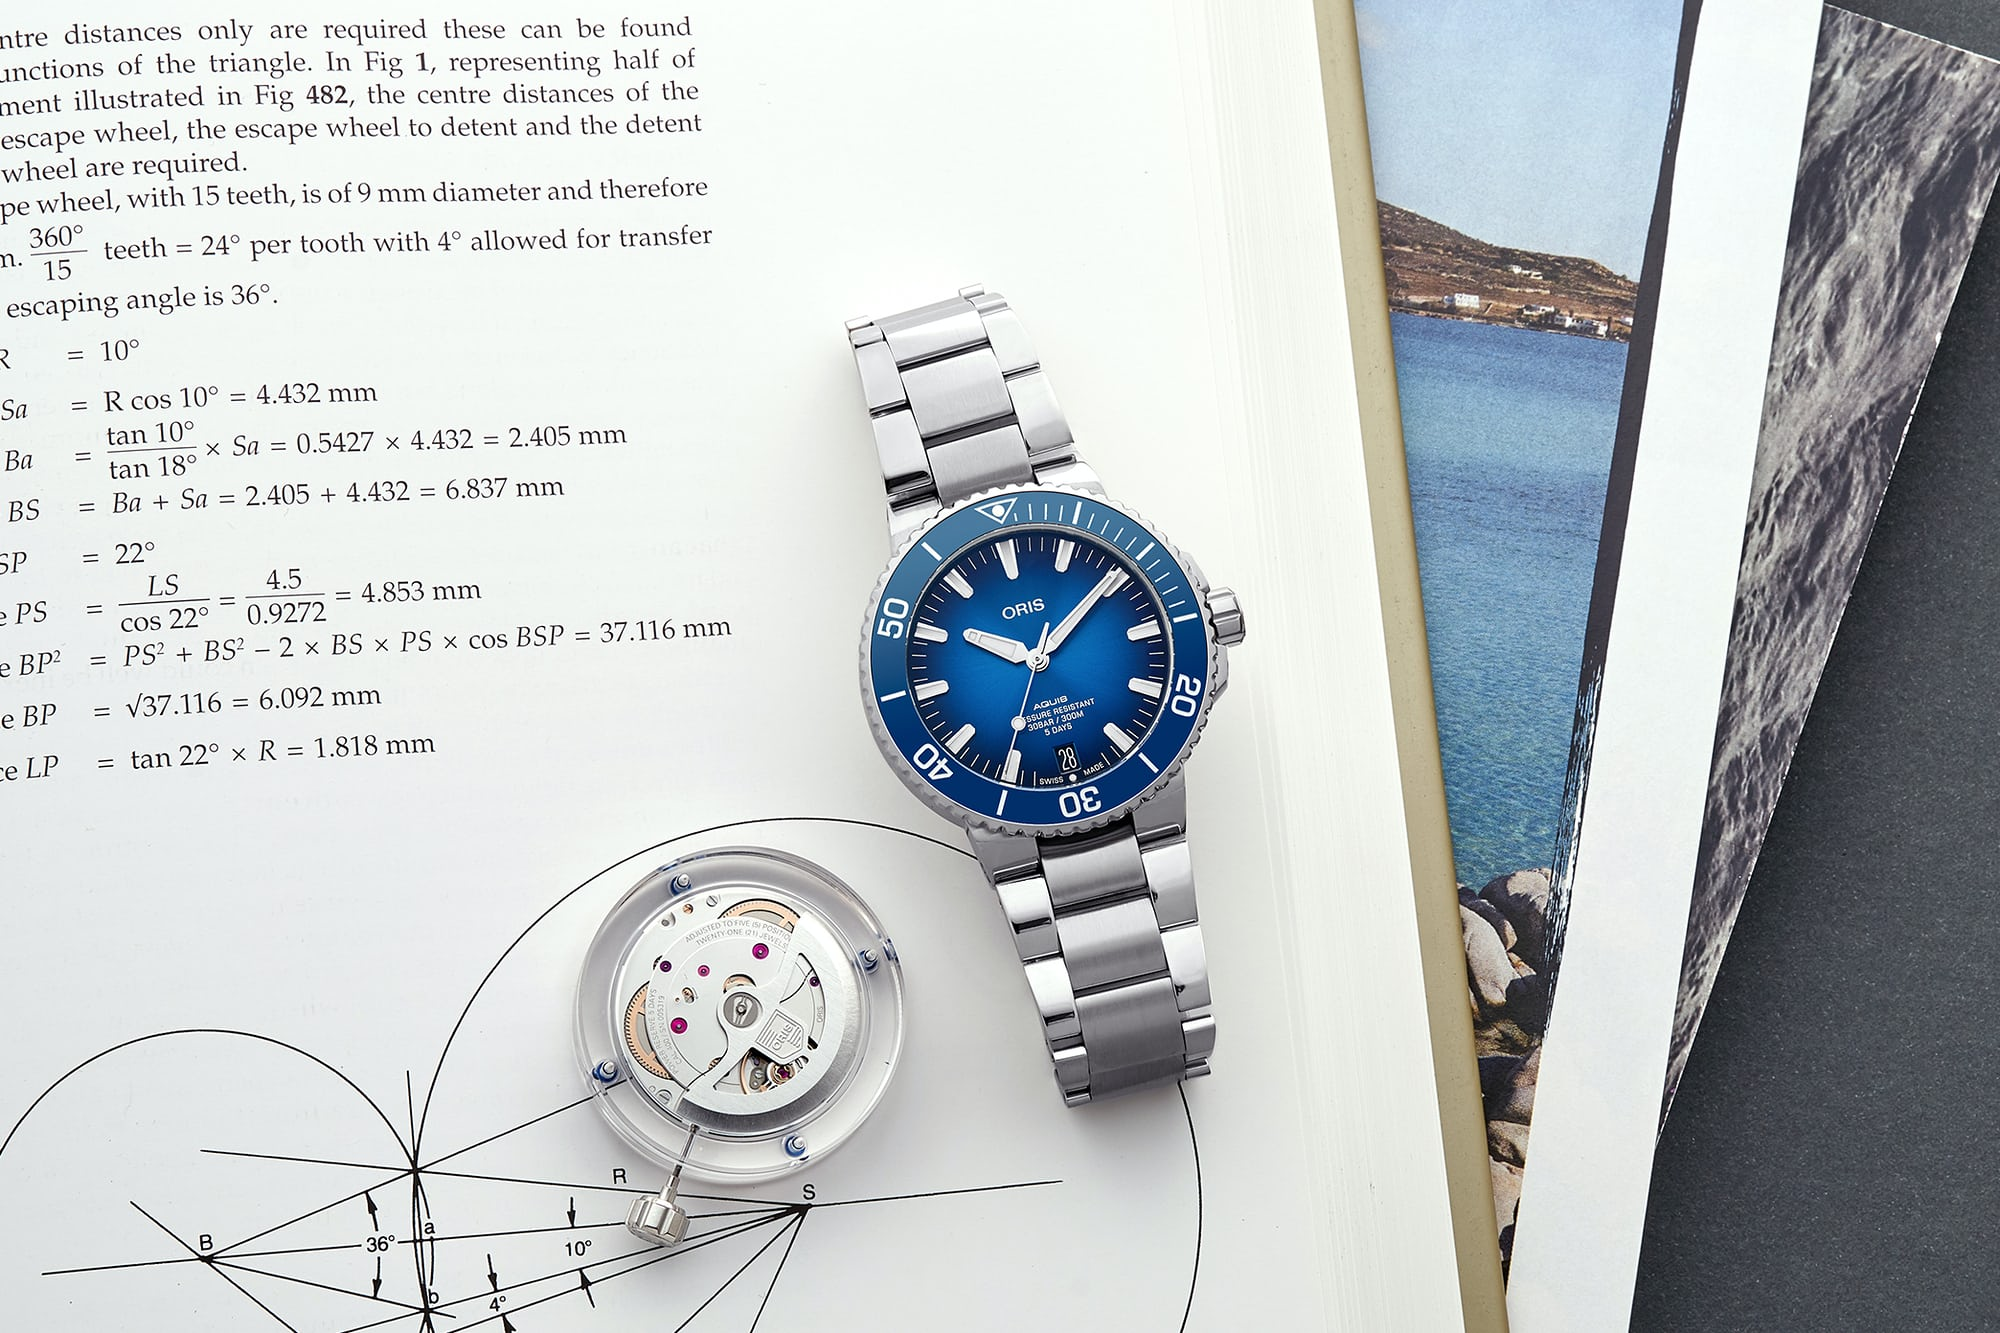 "<p><a href=""https://shop.hodinkee.com/collections/oris/products/oris-aquis-date-caliber-400-bracelet?variant=32905336488011"" rel=""noopener"" target=""_blank""><u>Oris Aquis Date Caliber 400</u></a></p>"